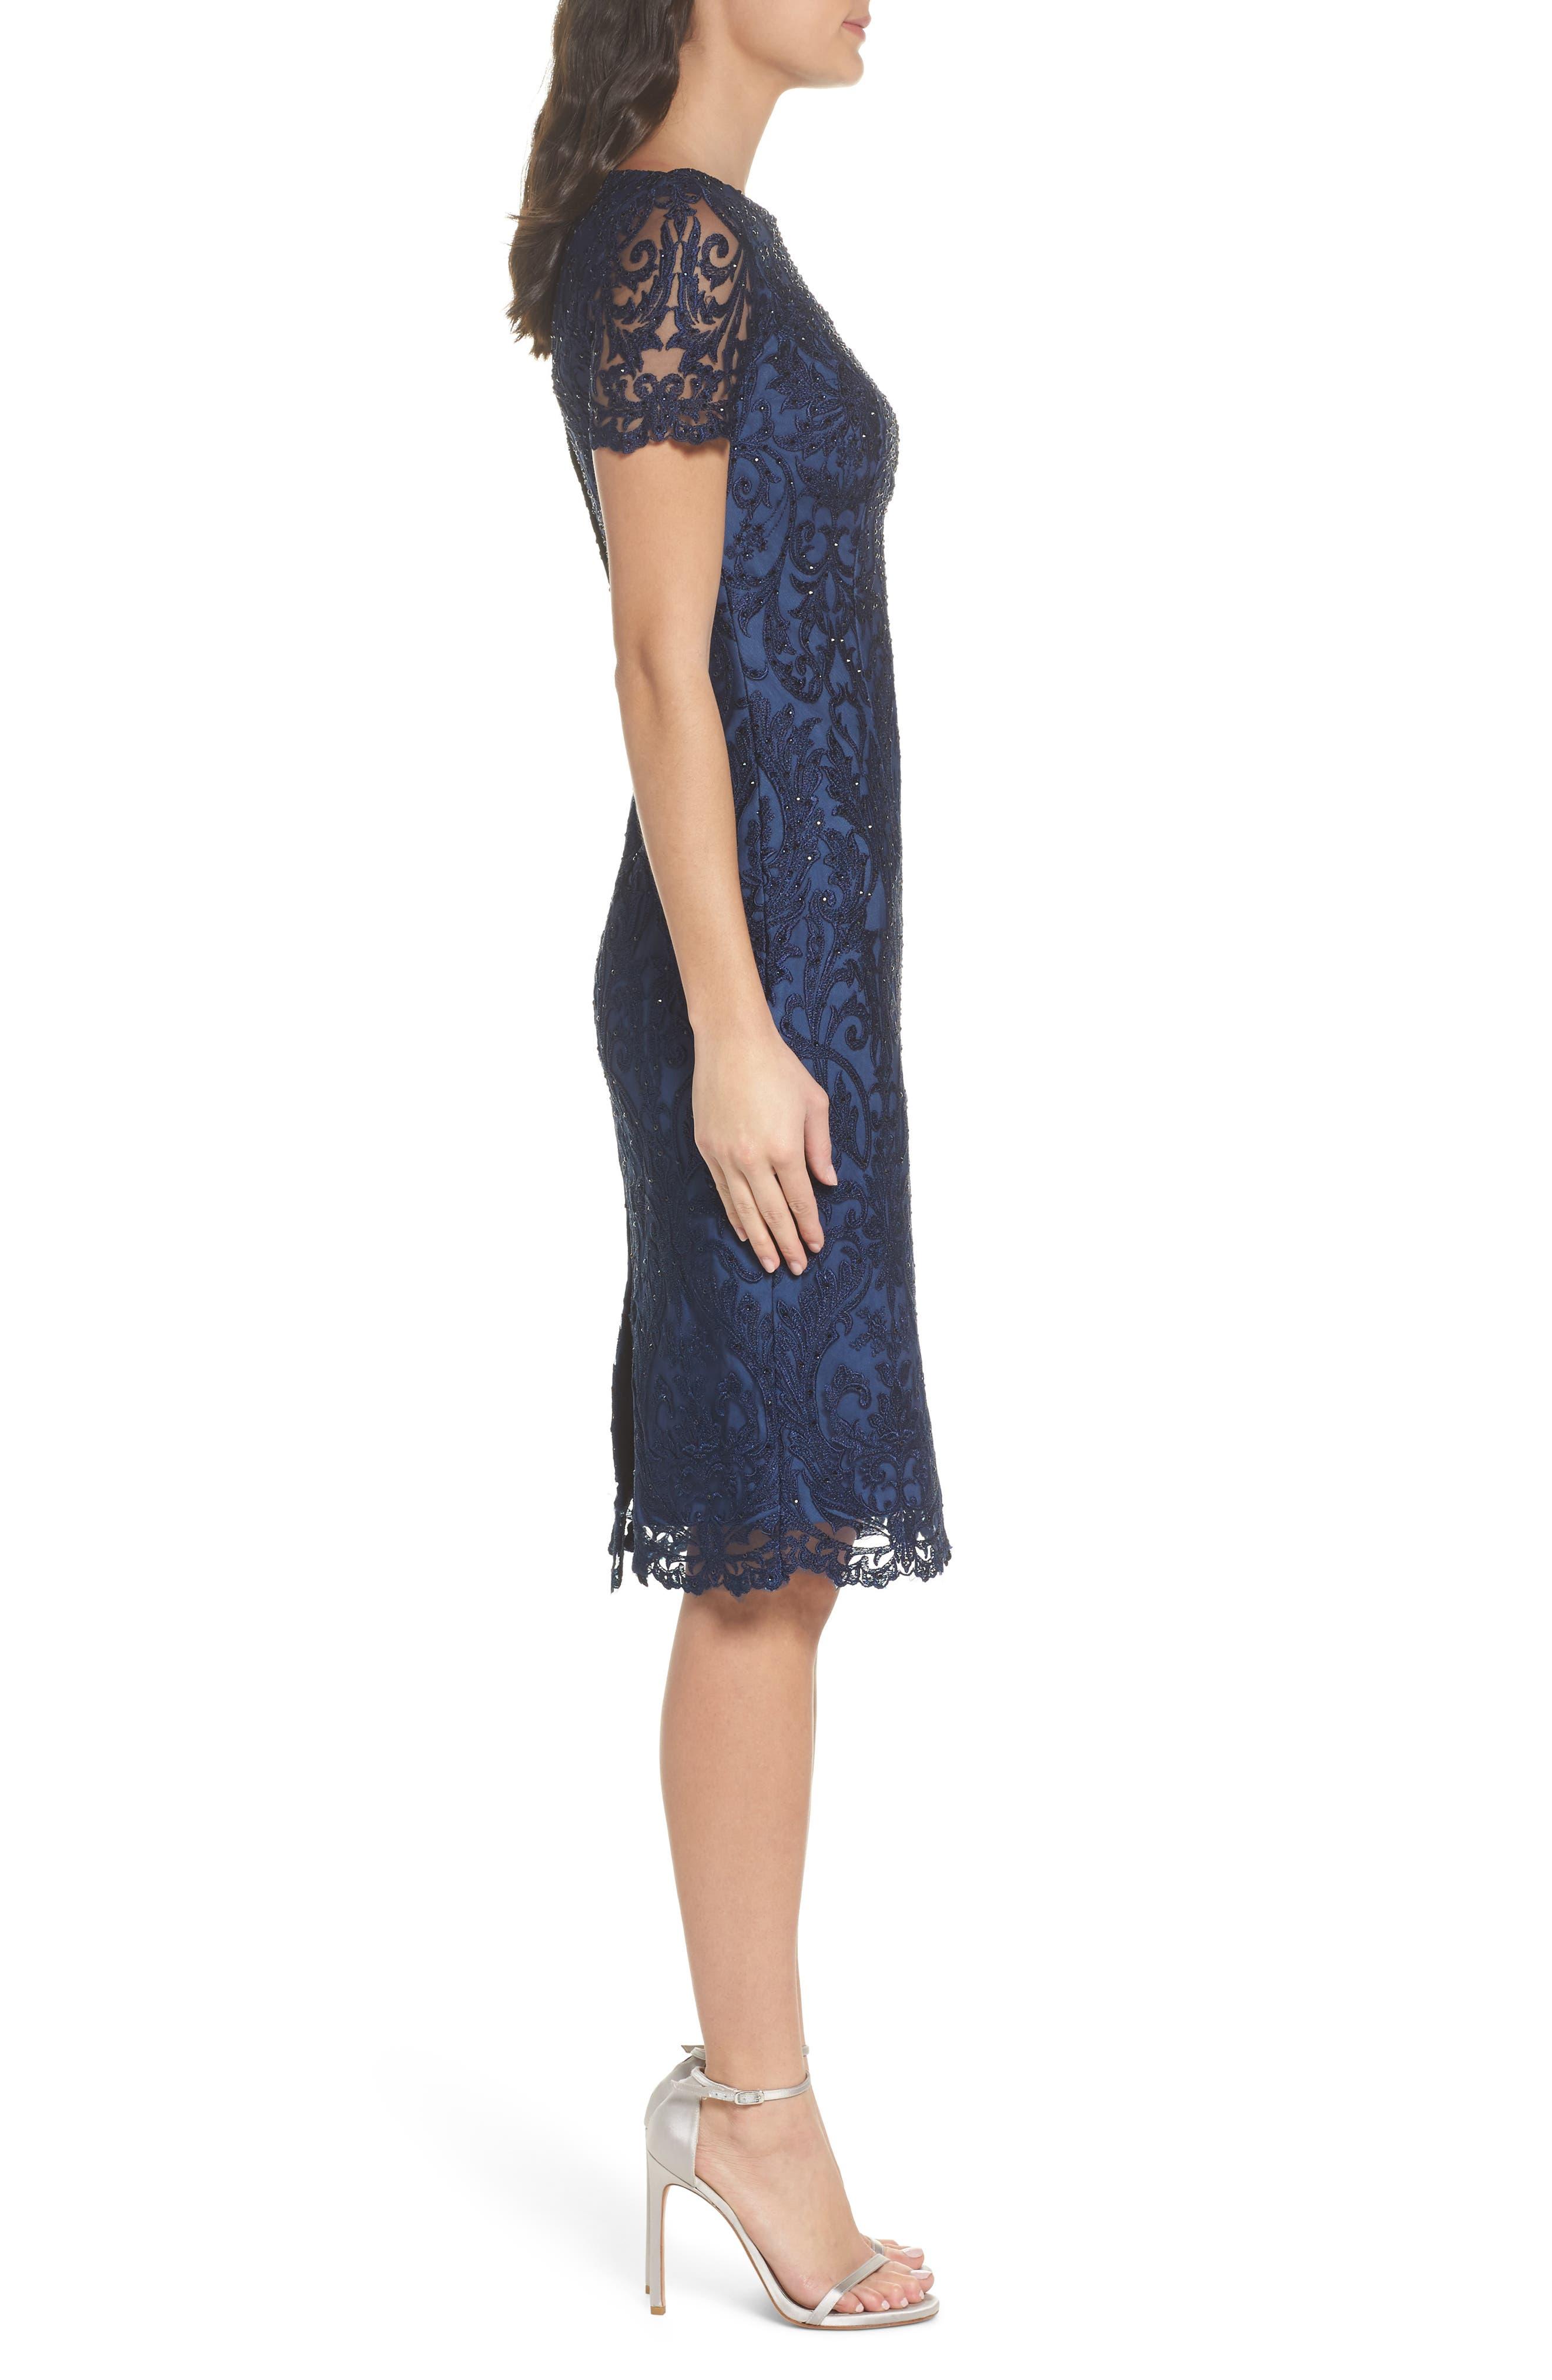 LA FEMME, Beaded Lace Sheath Dress, Alternate thumbnail 3, color, SLATE BLUE